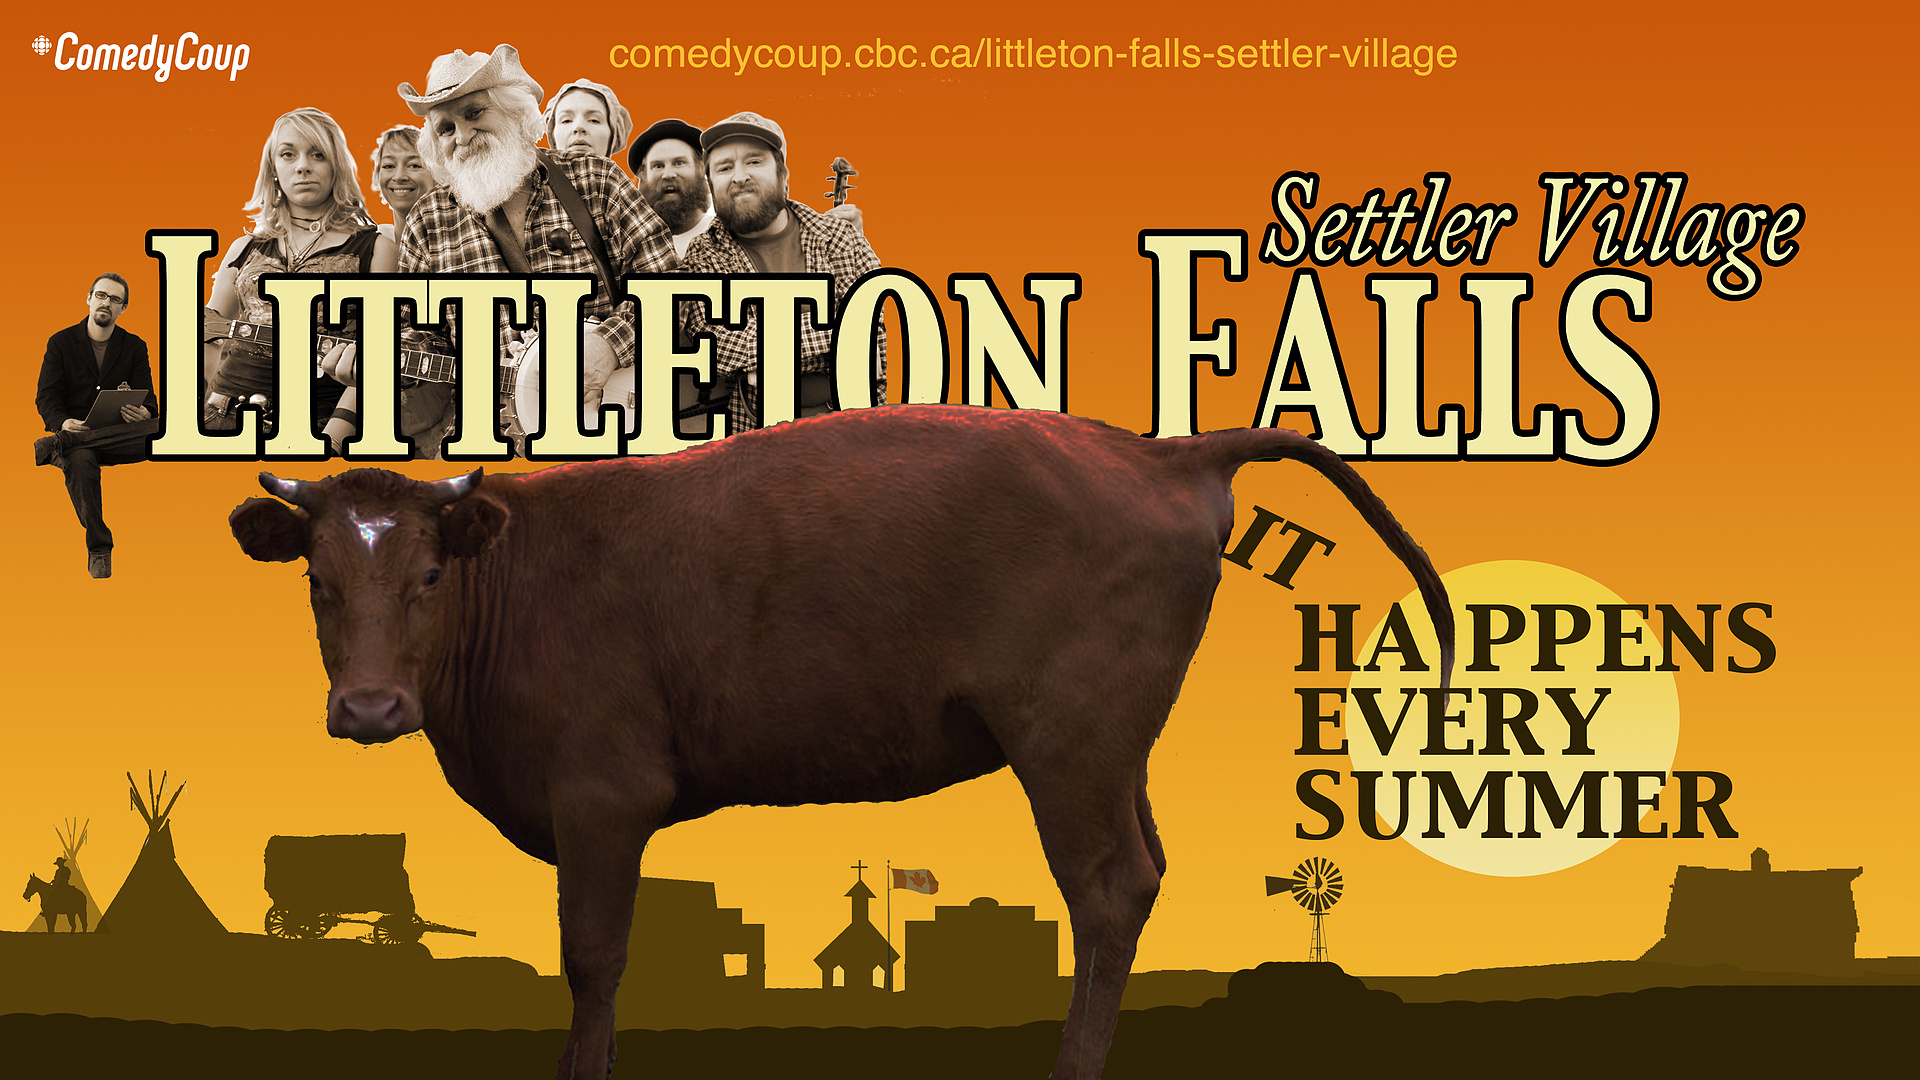 Week 4 Key It: Poster A Littleton Falls Settler Village